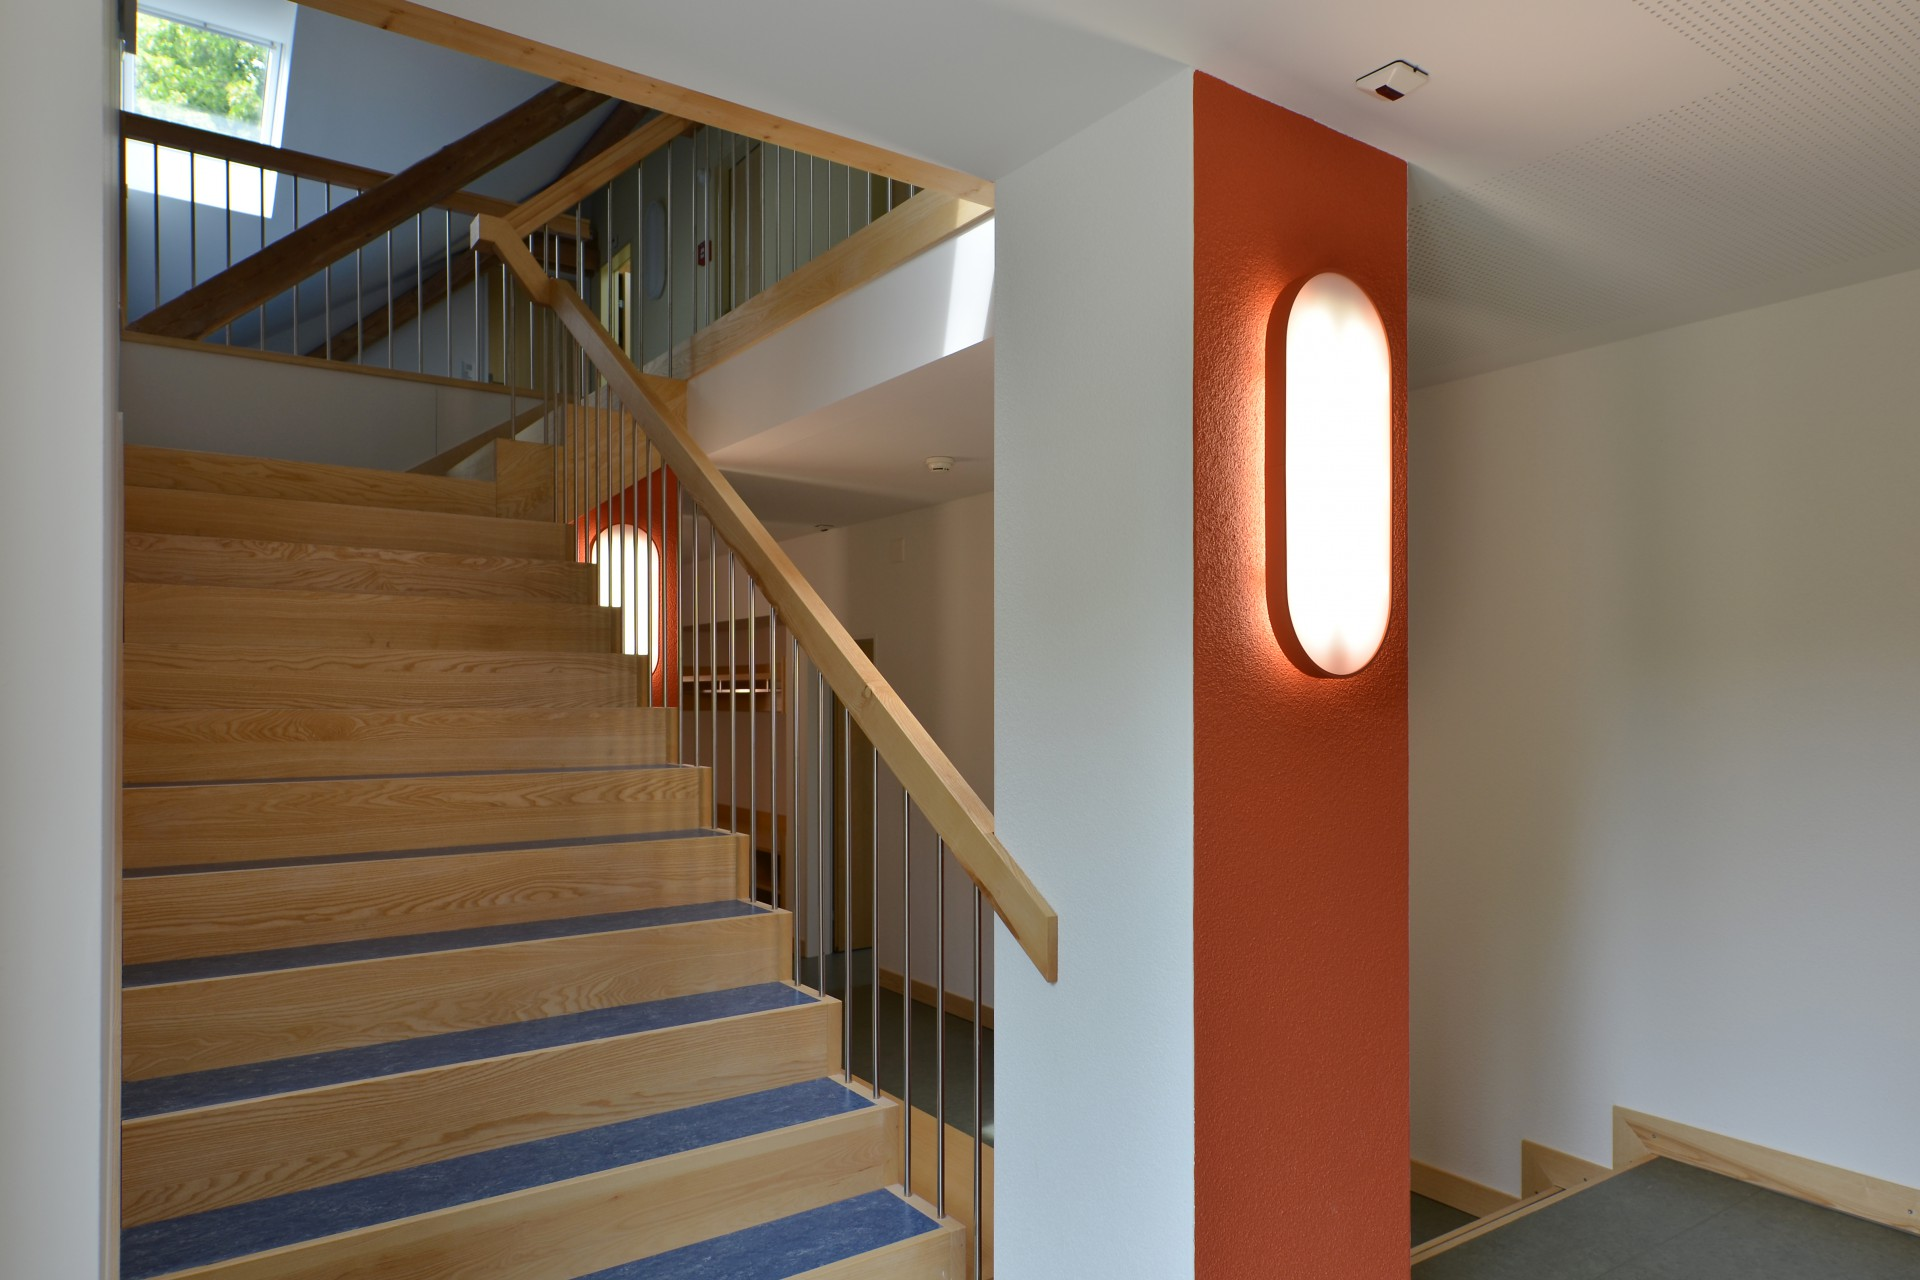 umbau jugendheim oberiwinterthurwohnenausgef hrt architekt winterthur uster. Black Bedroom Furniture Sets. Home Design Ideas